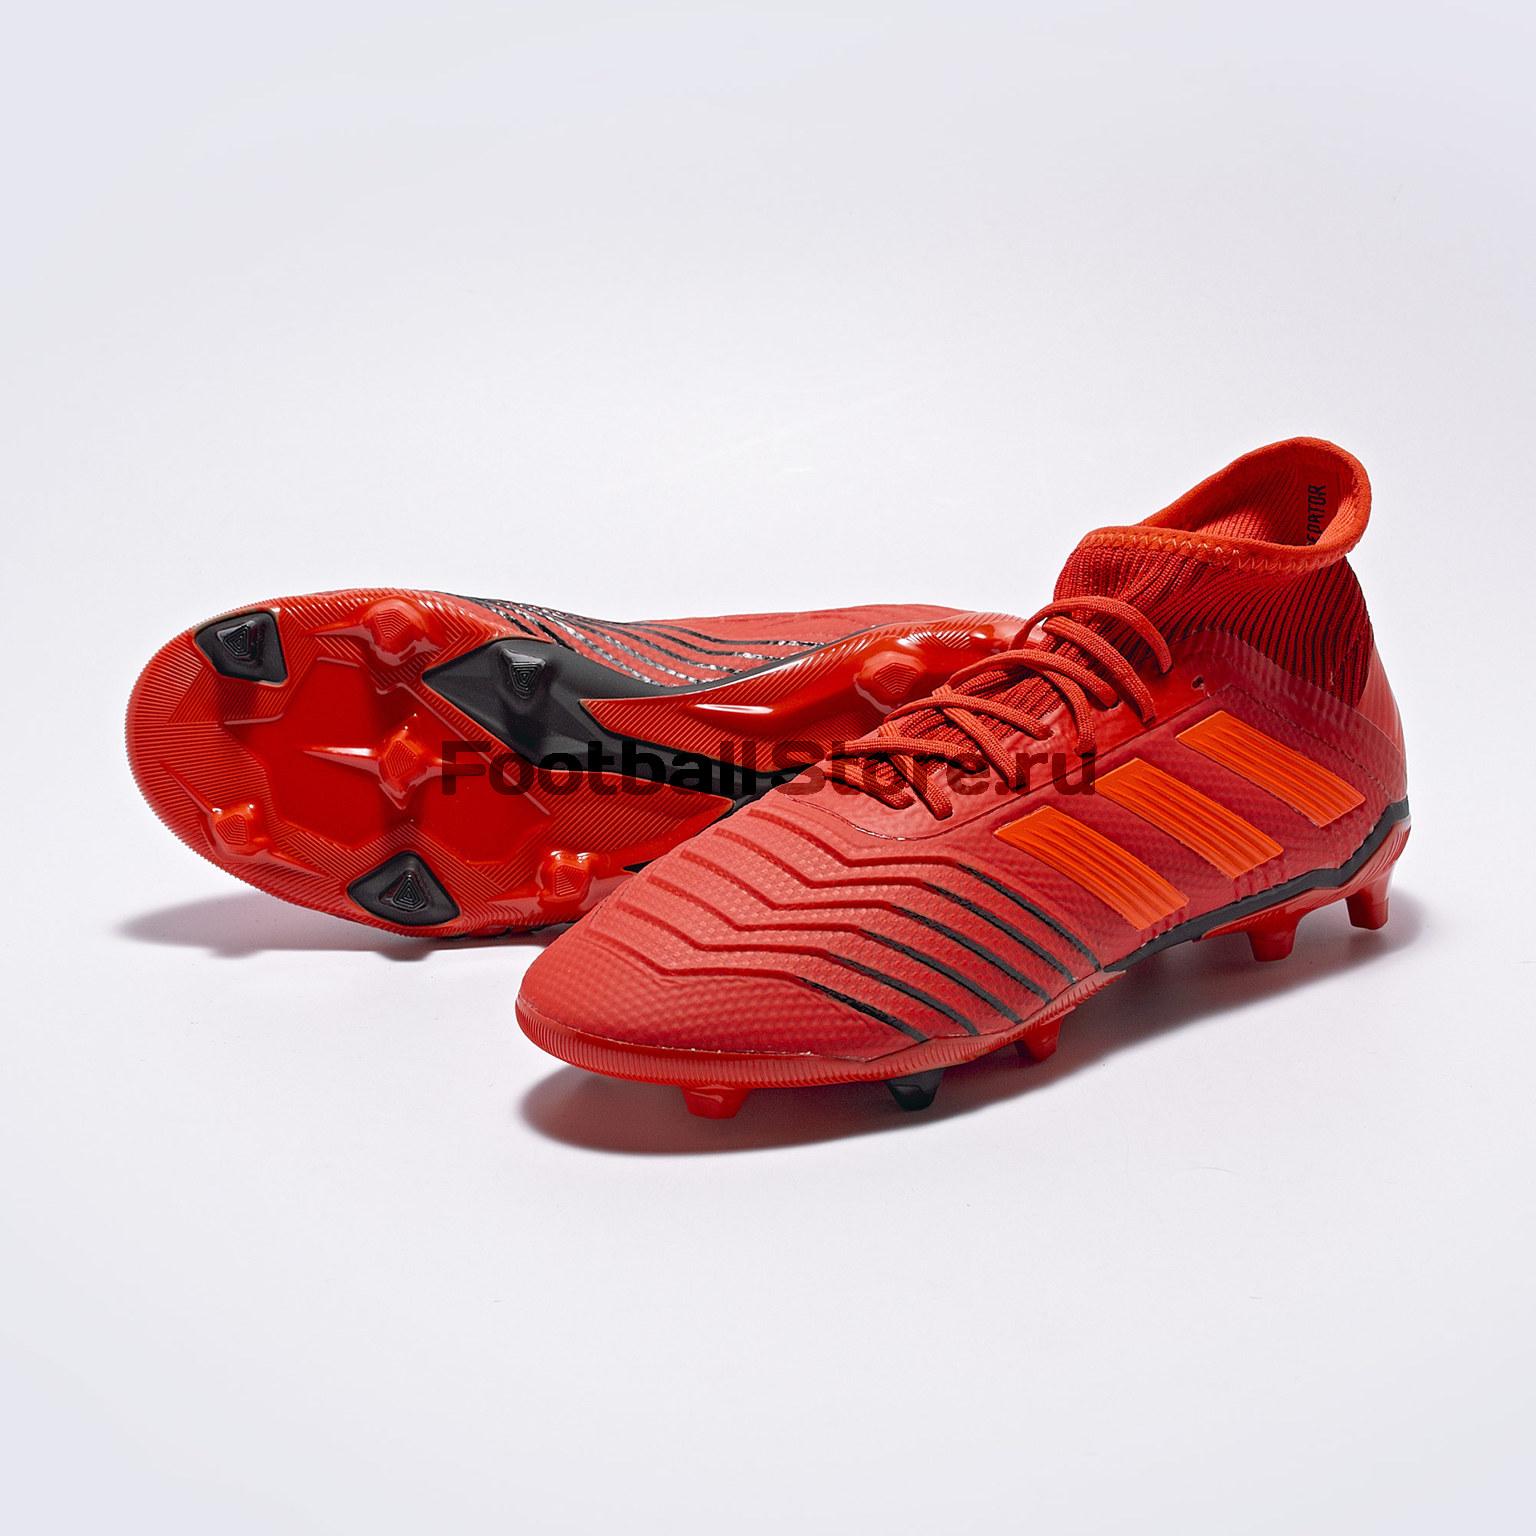 все цены на Бутсы детские Adidas Predator 19.1 FG CM8529 онлайн